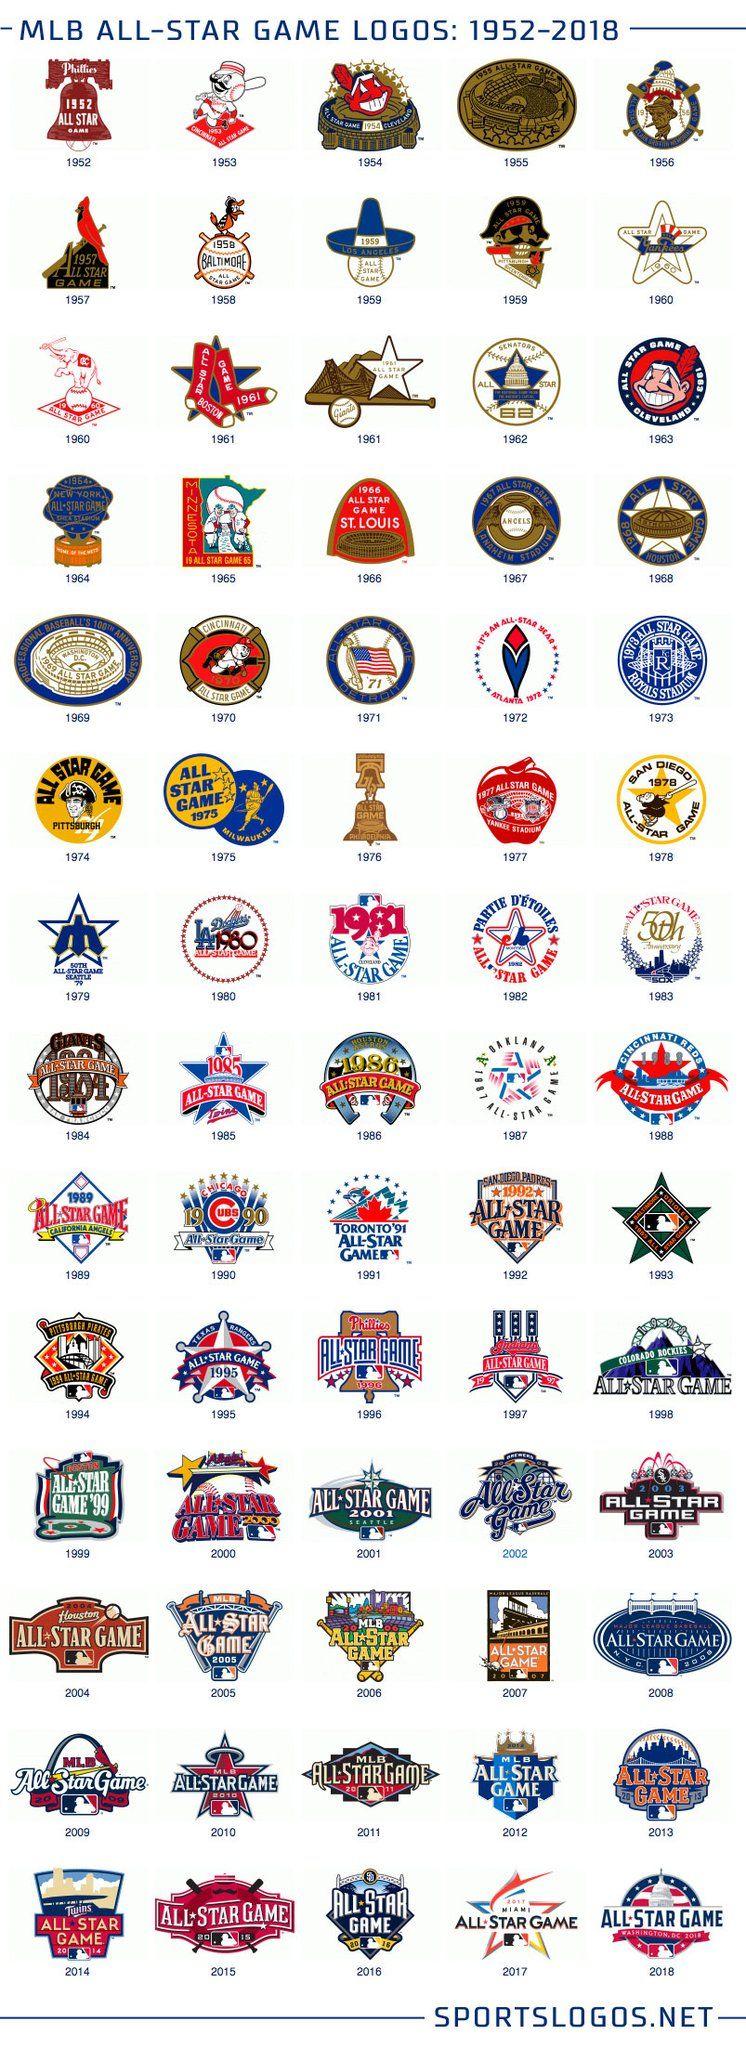 mlb all star game logos 19522018 sports logos